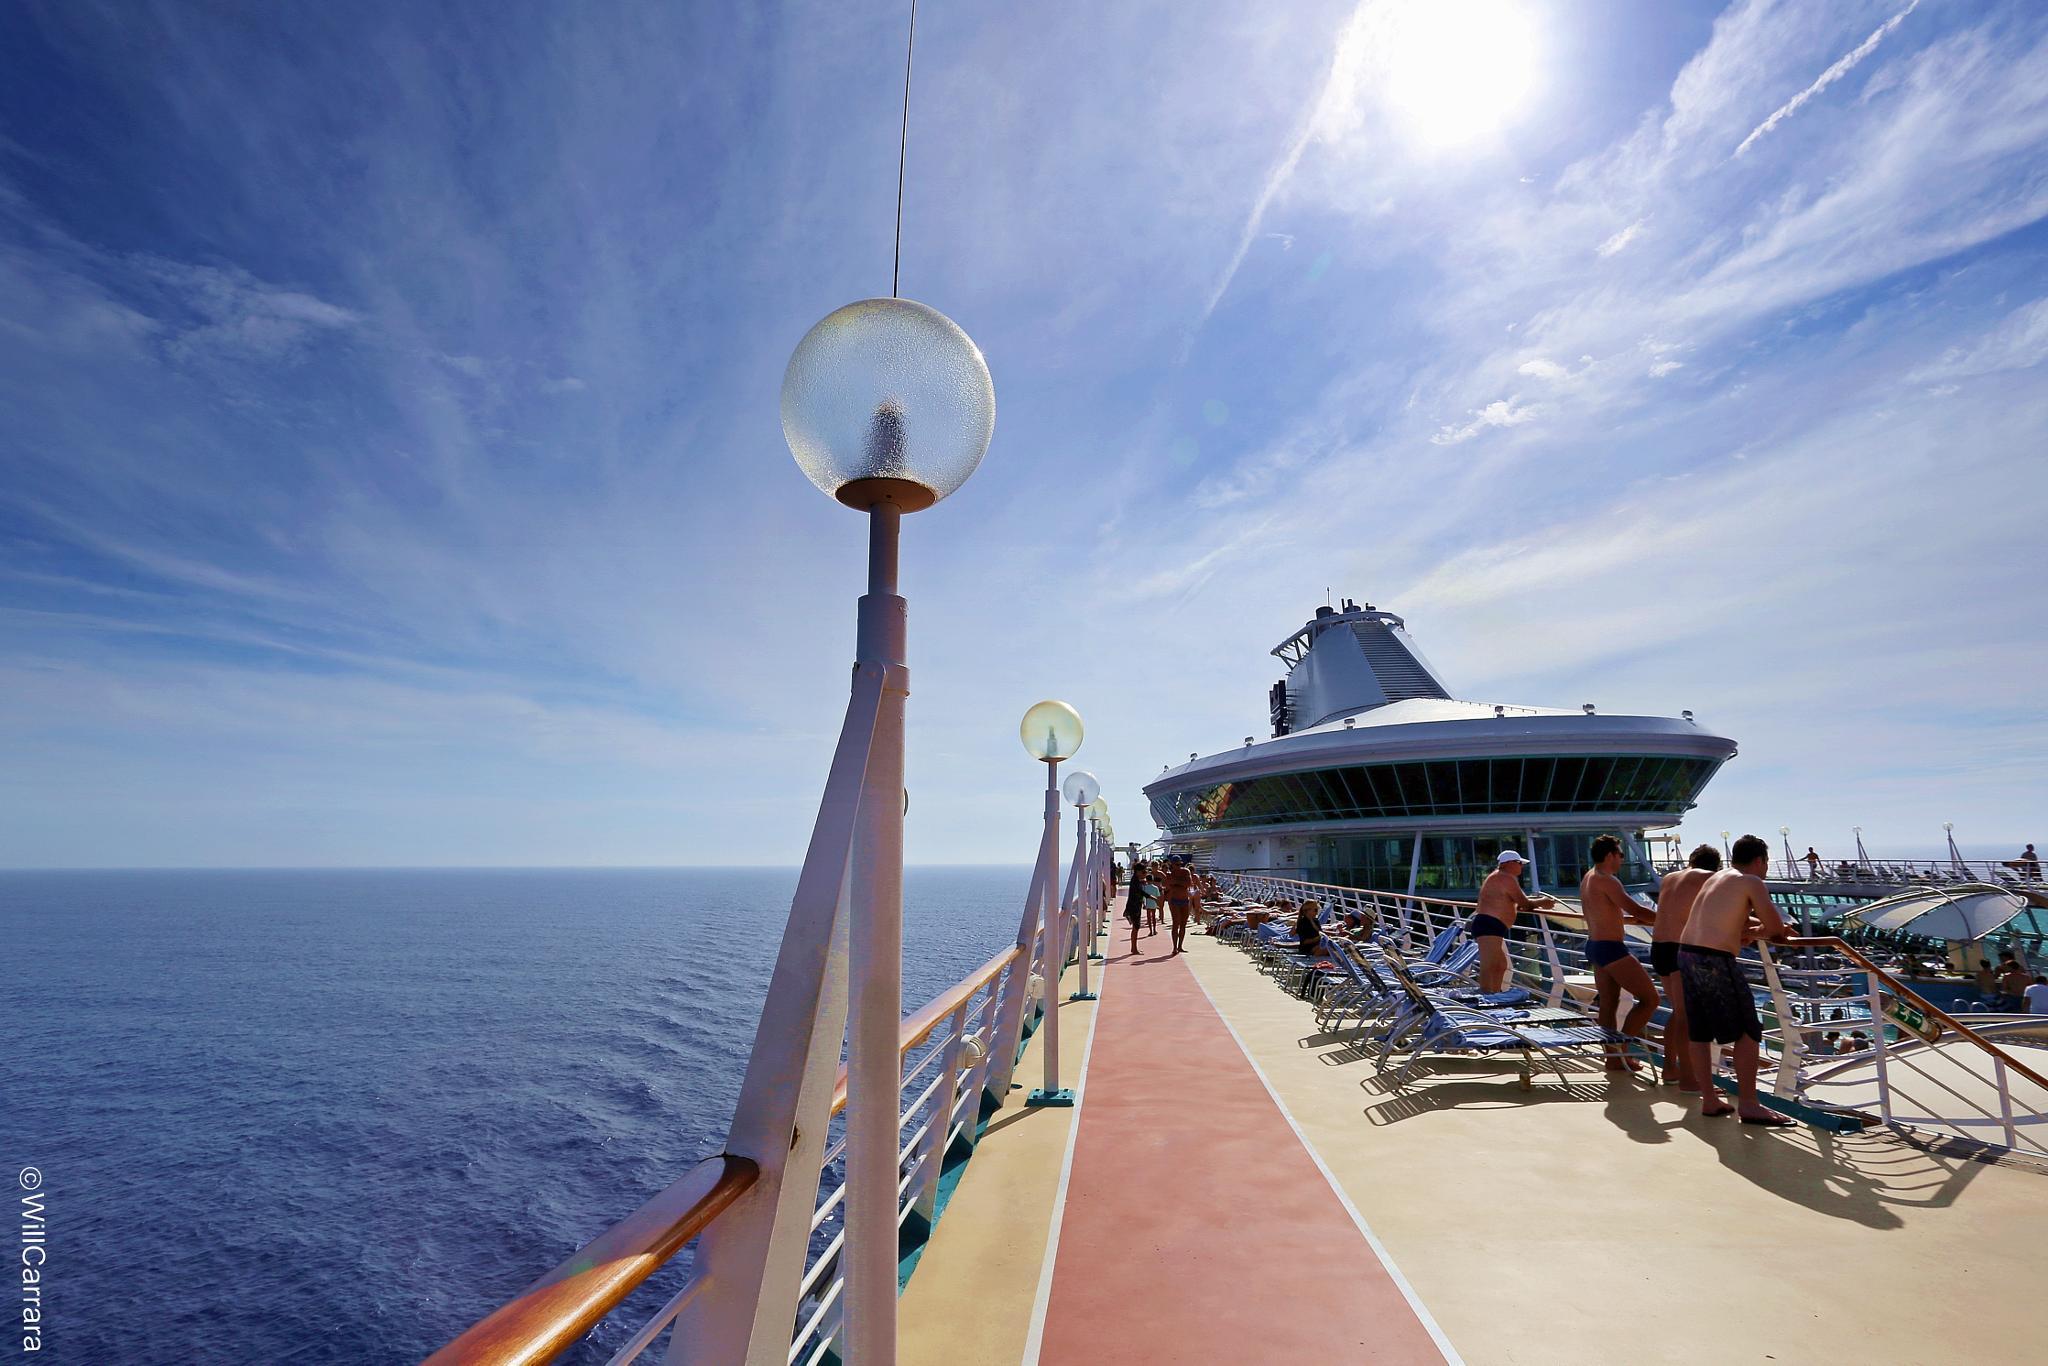 Cruzeiro Splendour of the Seas 2015 - Royal Caribbean International  by Will Carrara Photographer